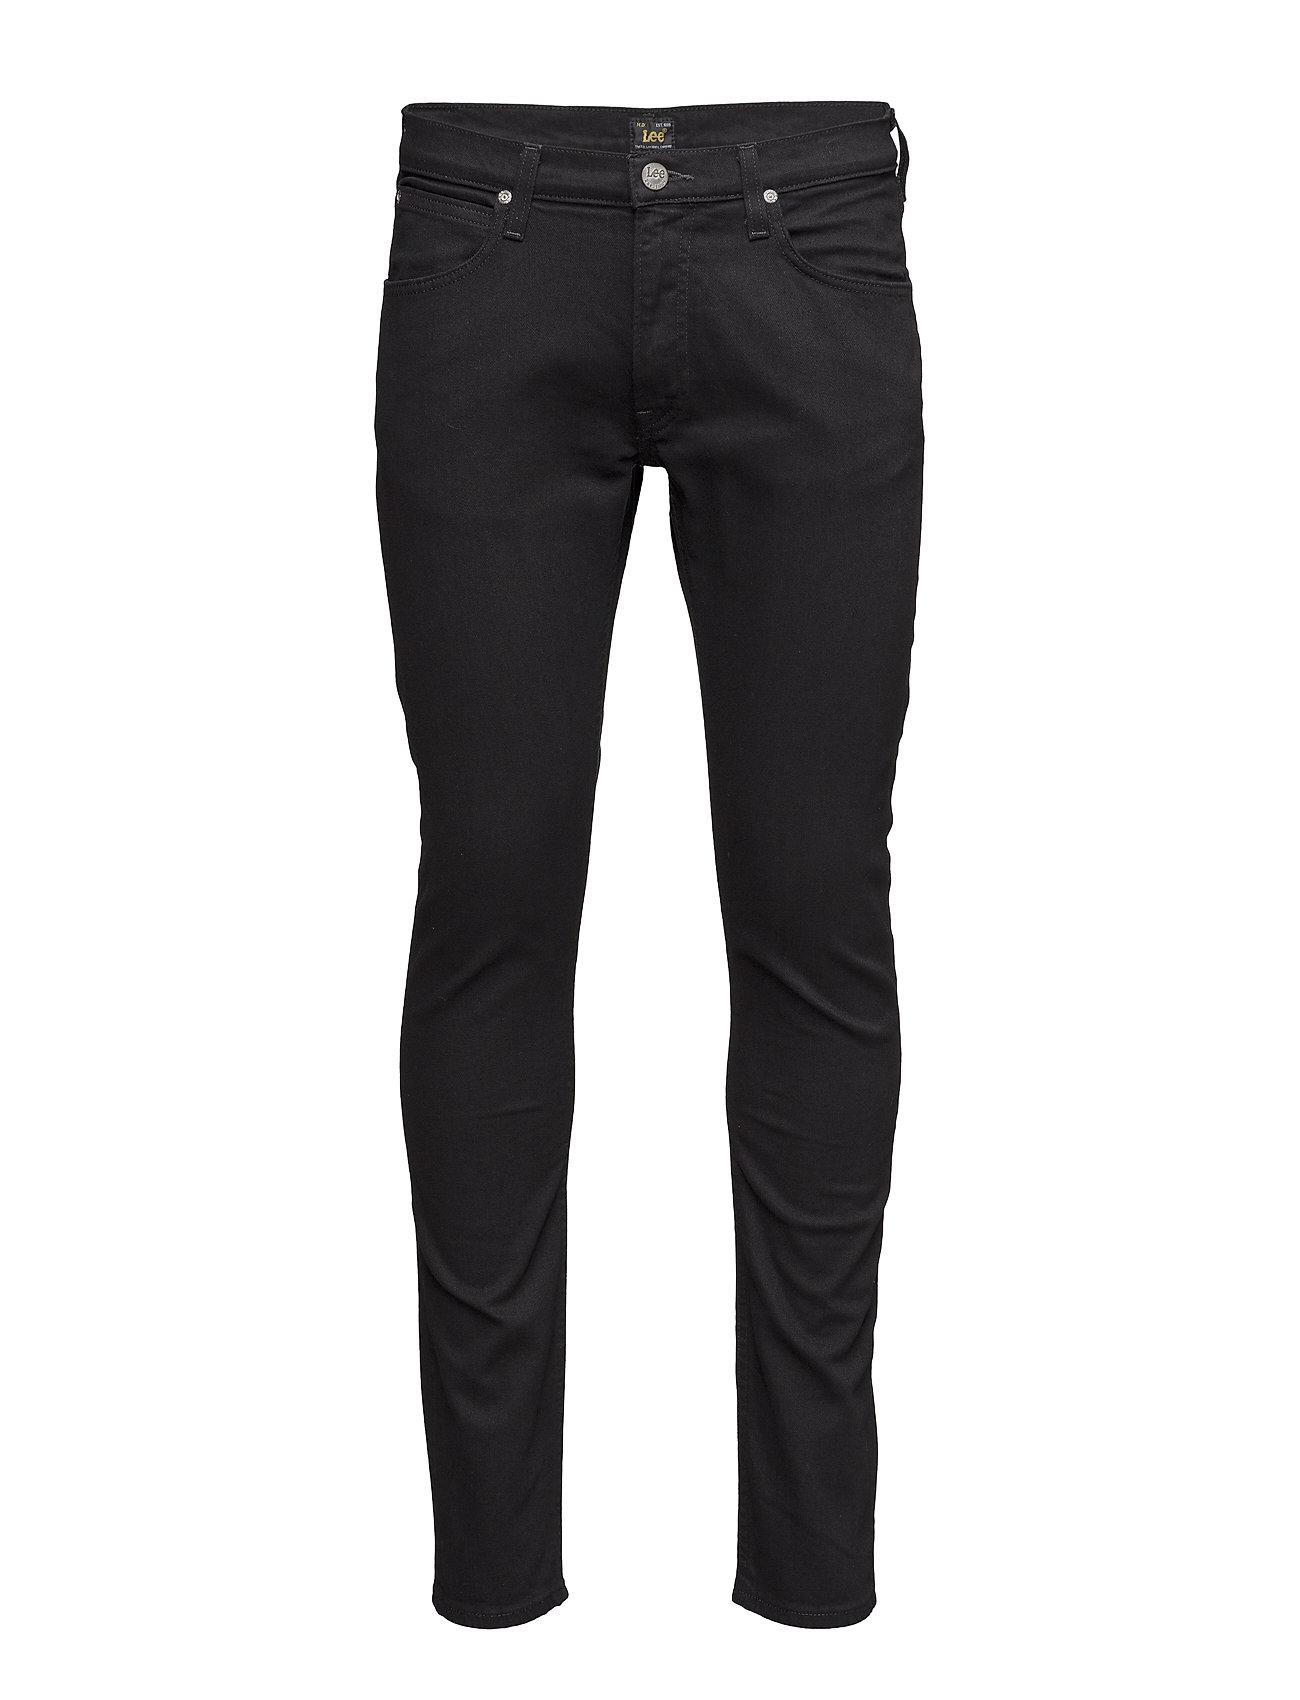 Lee Jeans LUKE - CLEAN BLACK